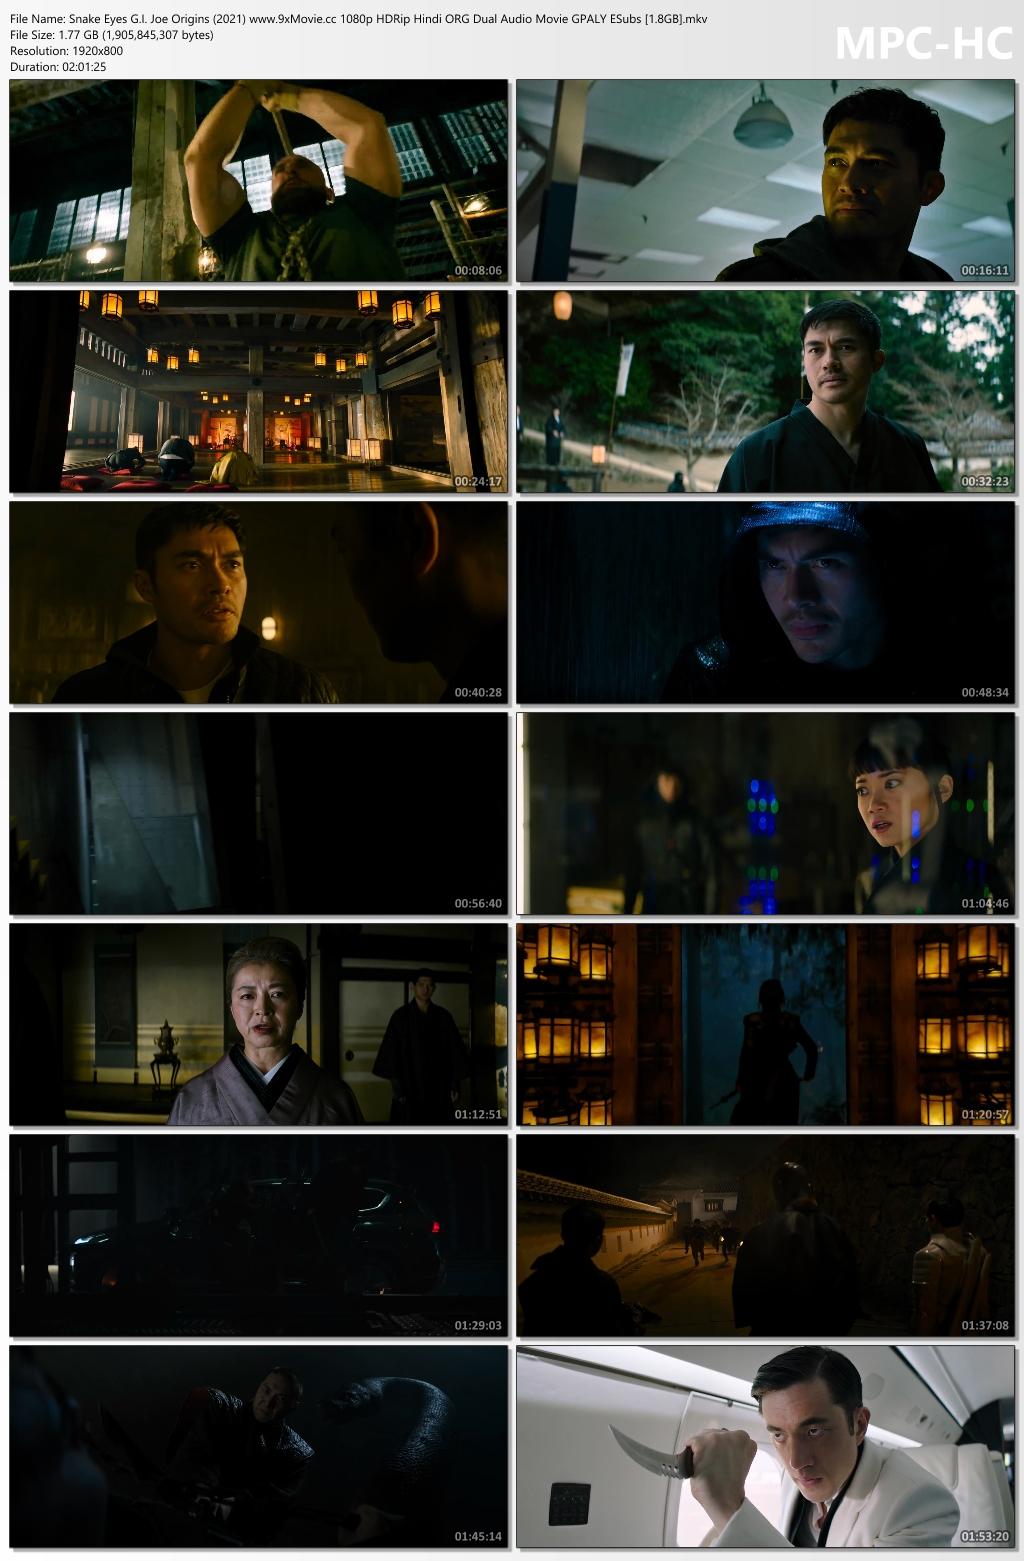 Snake-Eyes-G-I-Joe-Origins-2021-www-9x-Movie-cc-1080p-HDRip-Hindi-ORG-Dual-Audio-Movie-GPALY-ESubs-1